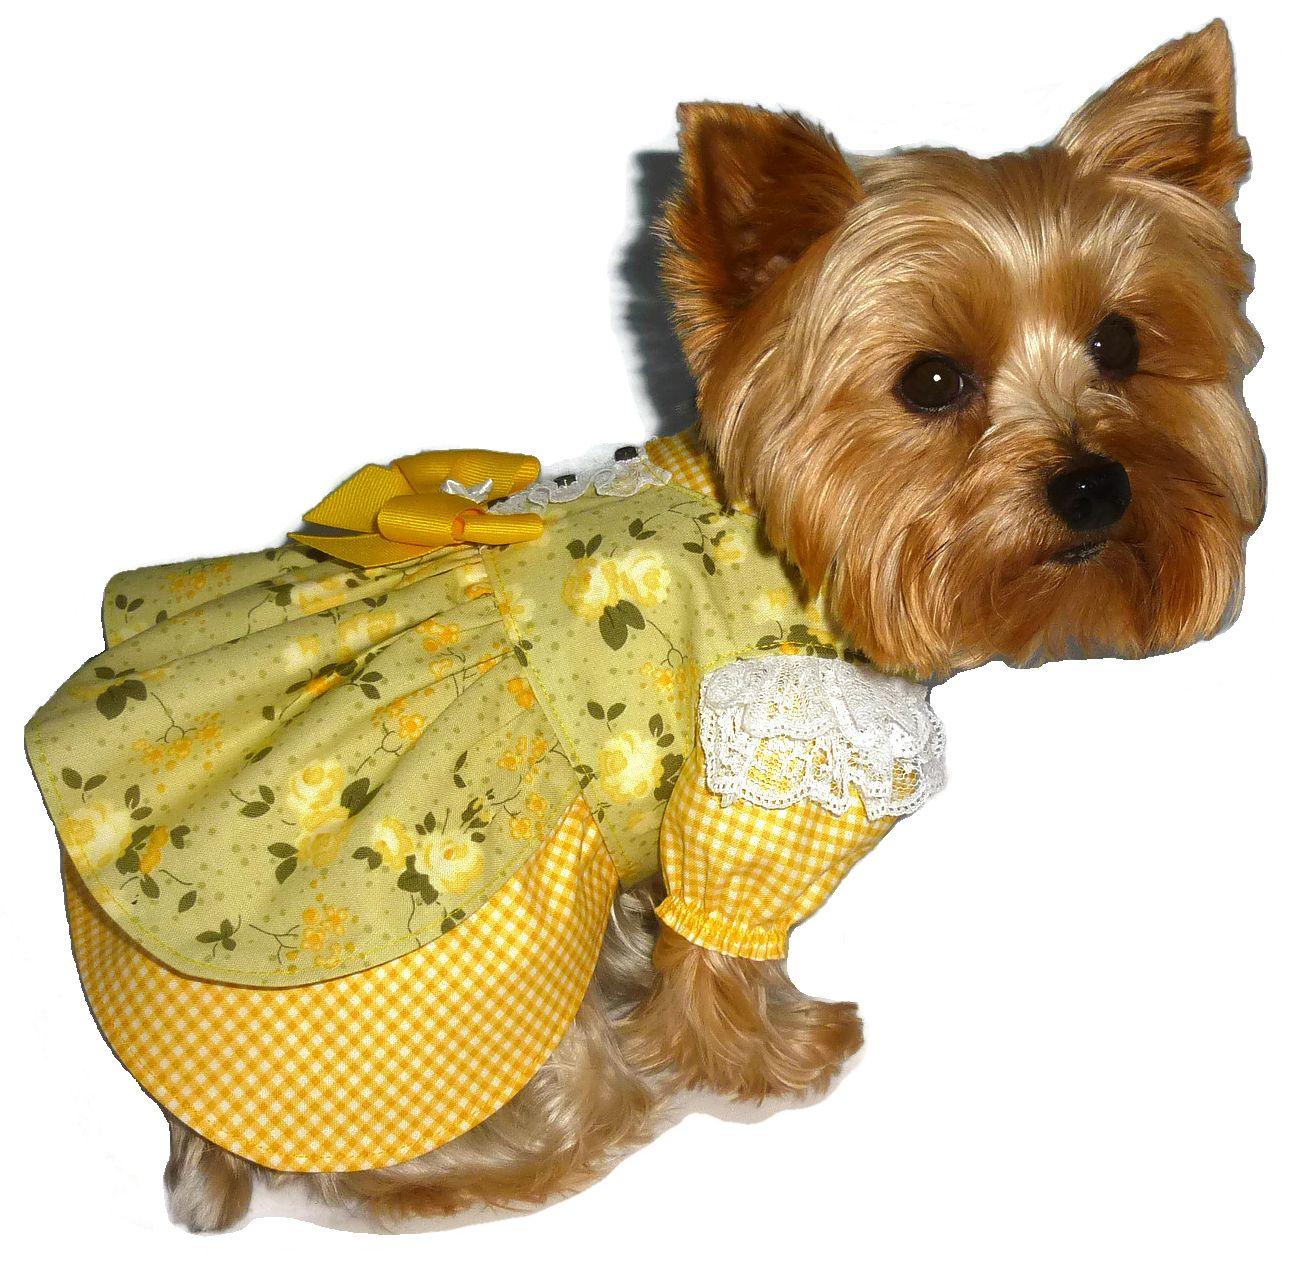 Dog clothes sewing pattern 1682 sara joe dress pinafore for the dog clothes sewing pattern 1682 sara joe dress pinafore for the little dog 825 jeuxipadfo Image collections